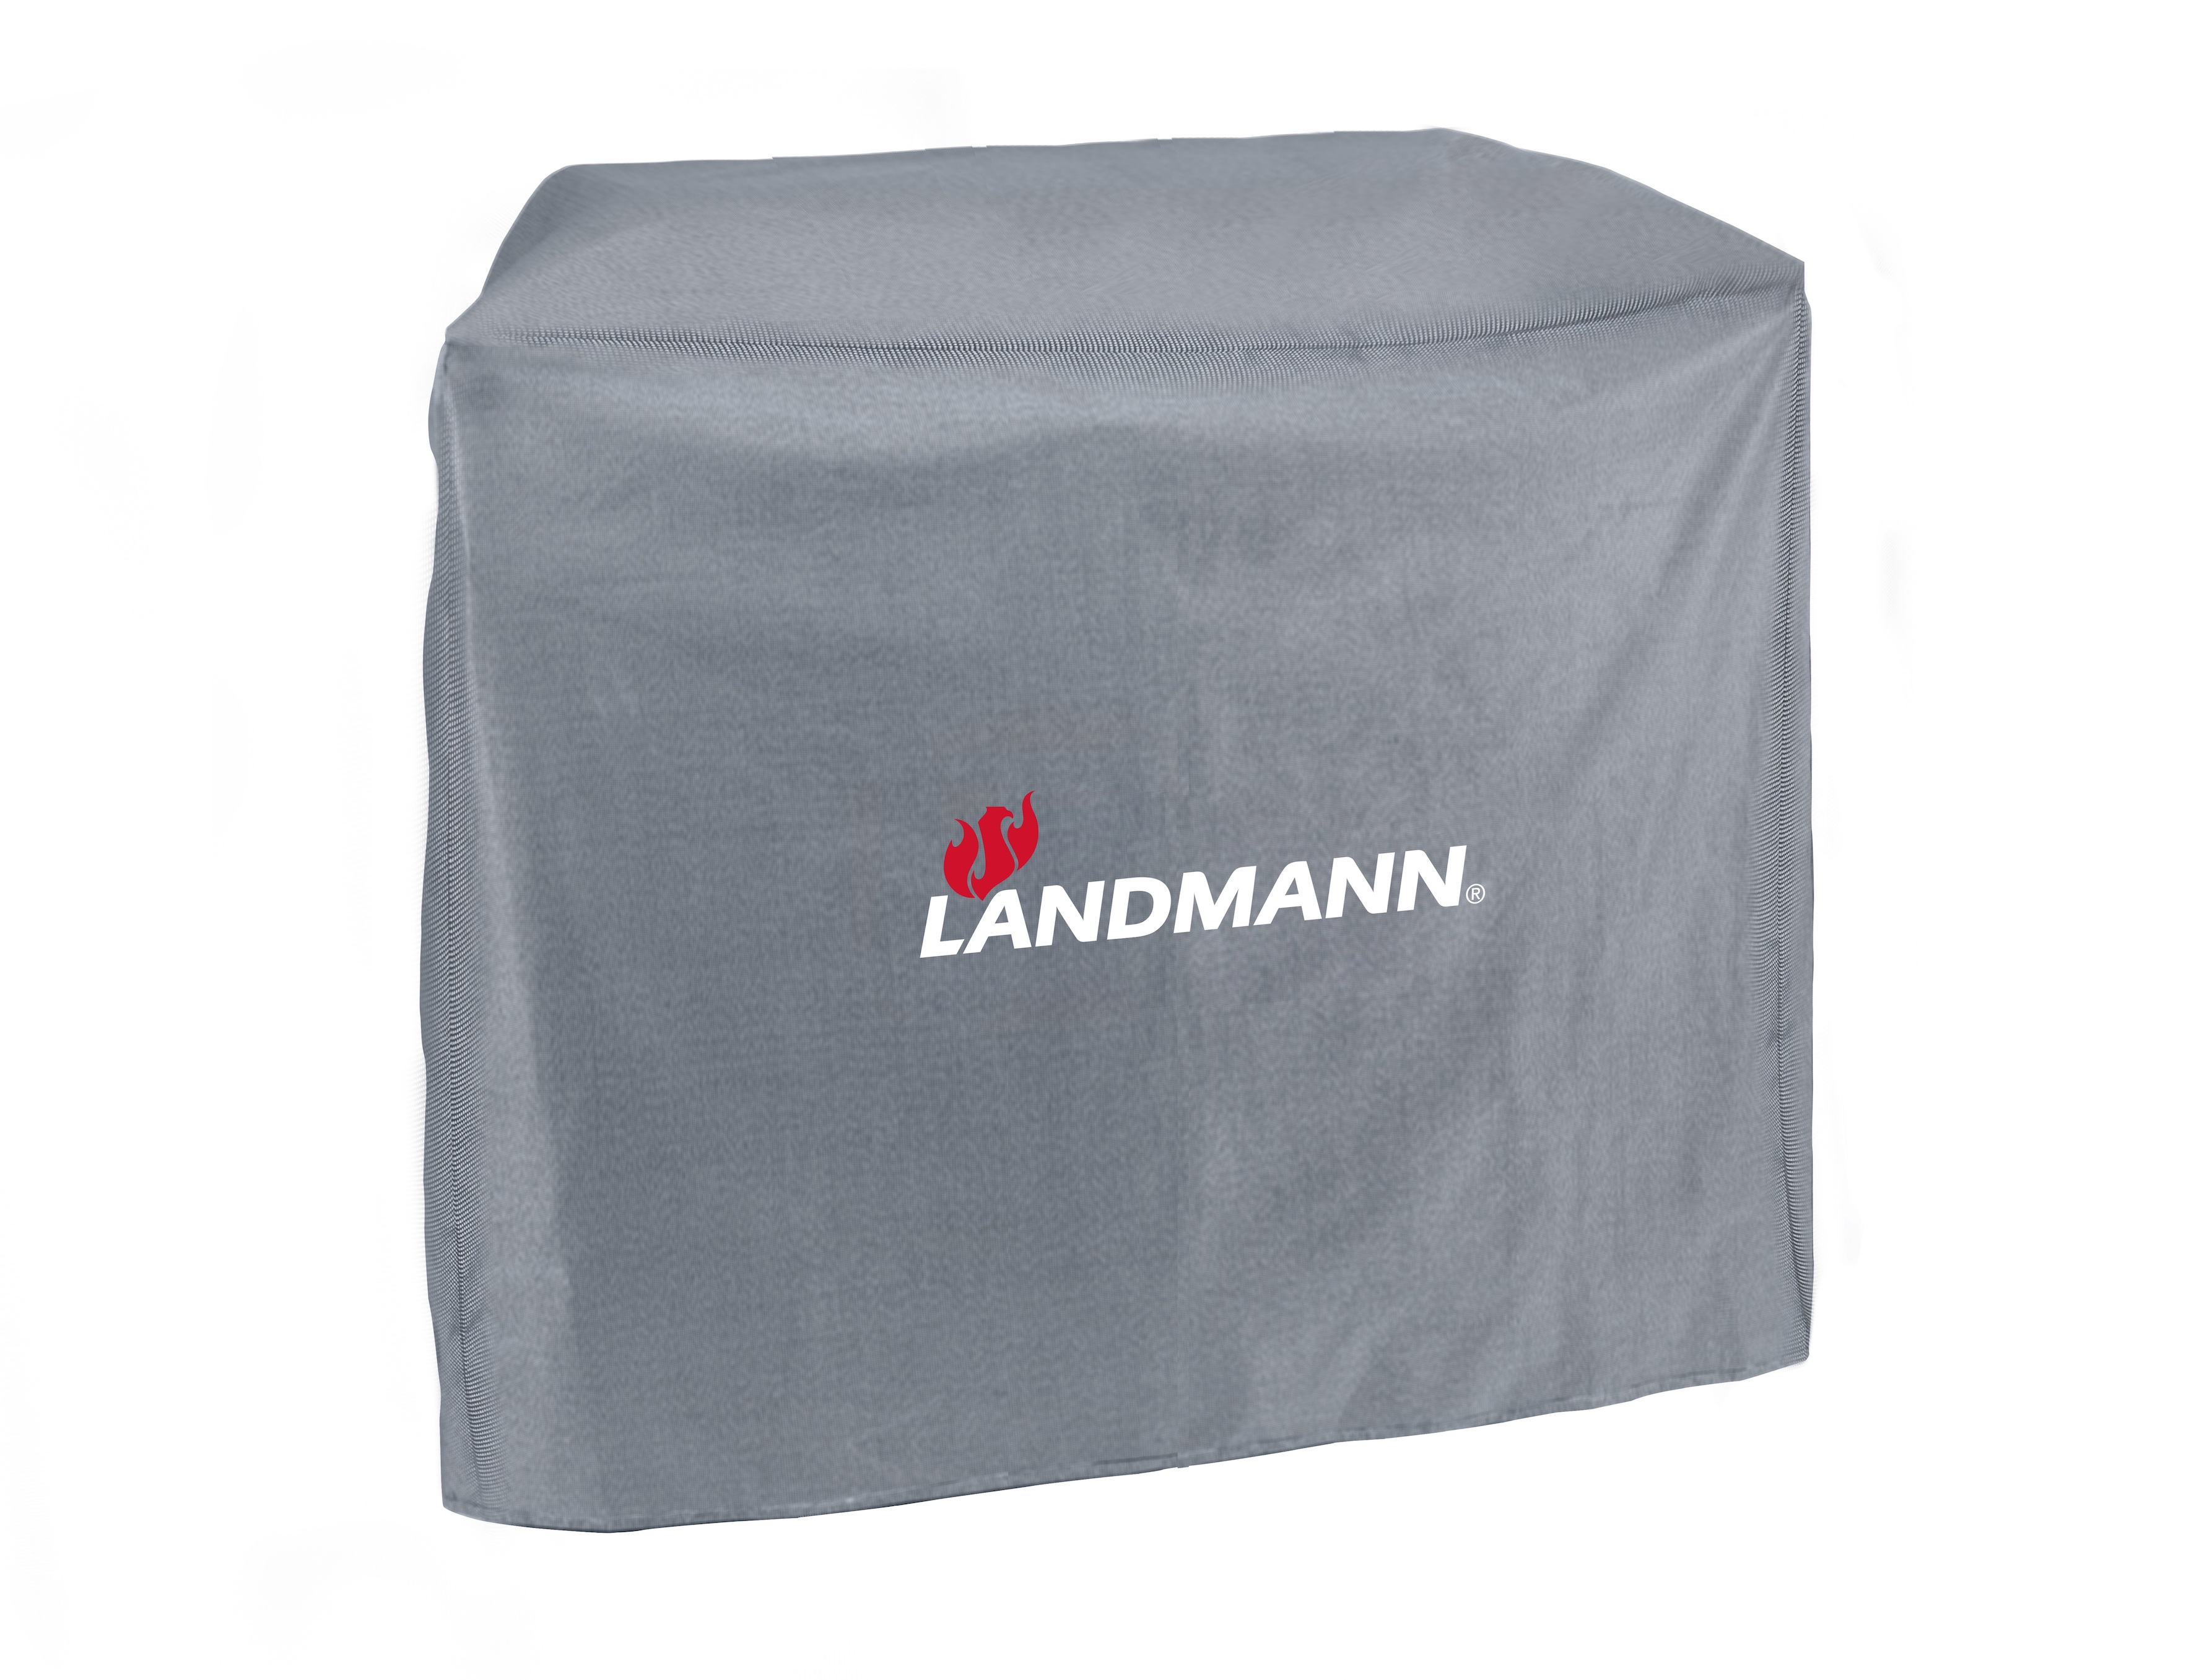 Landmann Holzkohlegrill Xxl 11510 : Landmann 15730 premium bbq cover for charcoal wagon xxl highgate